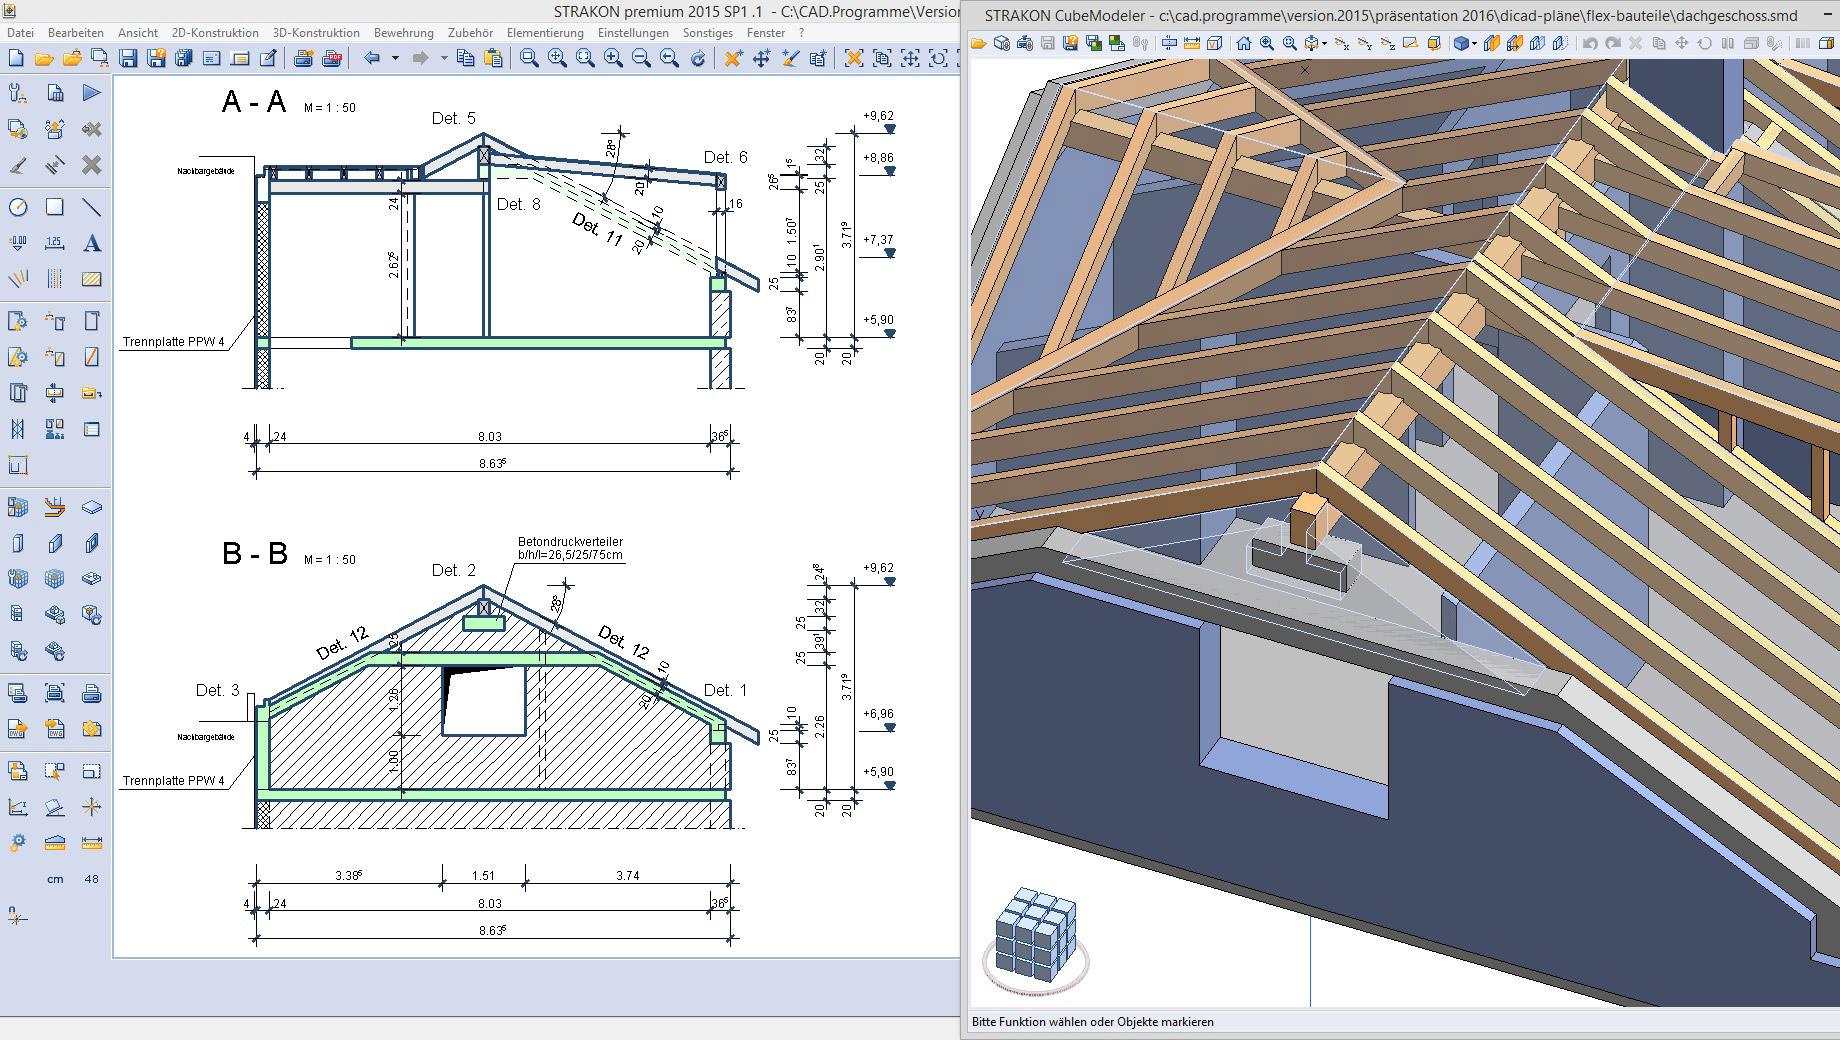 Bim 3d Planung Mit Der Cad Software Strakon Dicad Diagram Dachkonstruktion